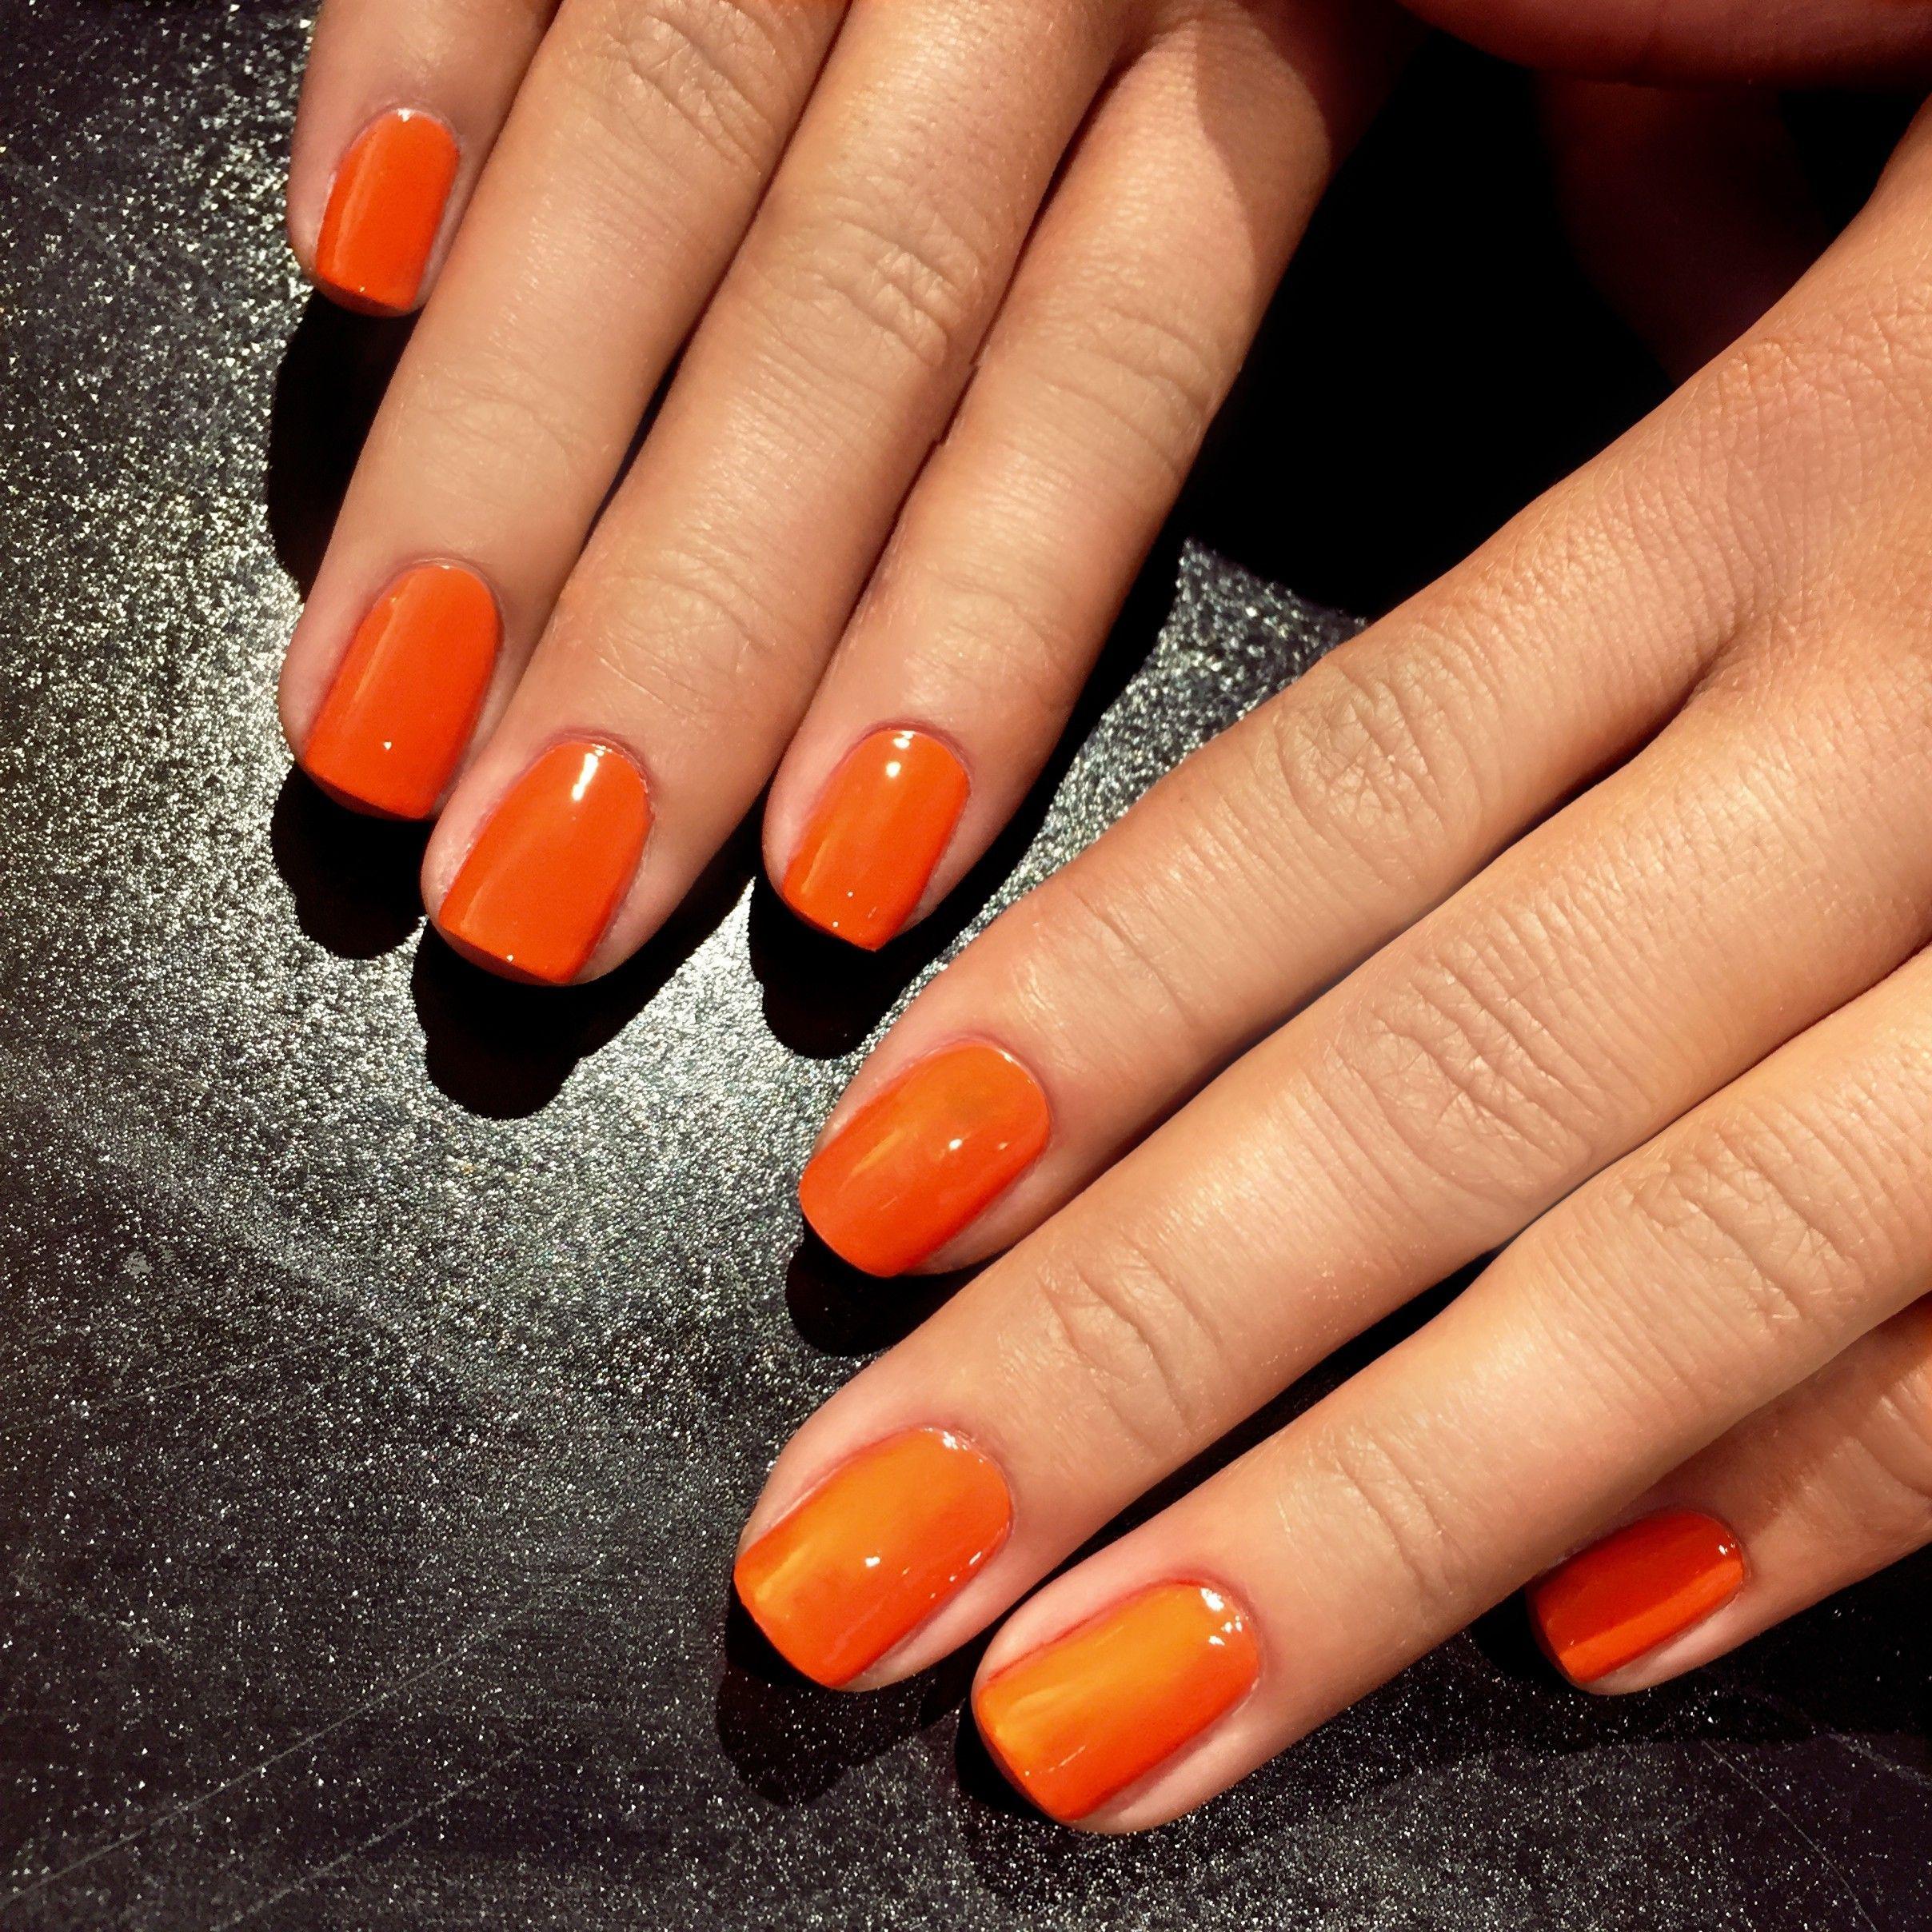 Jinsoon Enflammèe  Ml Orange nailart  Nail Art  Pinterest